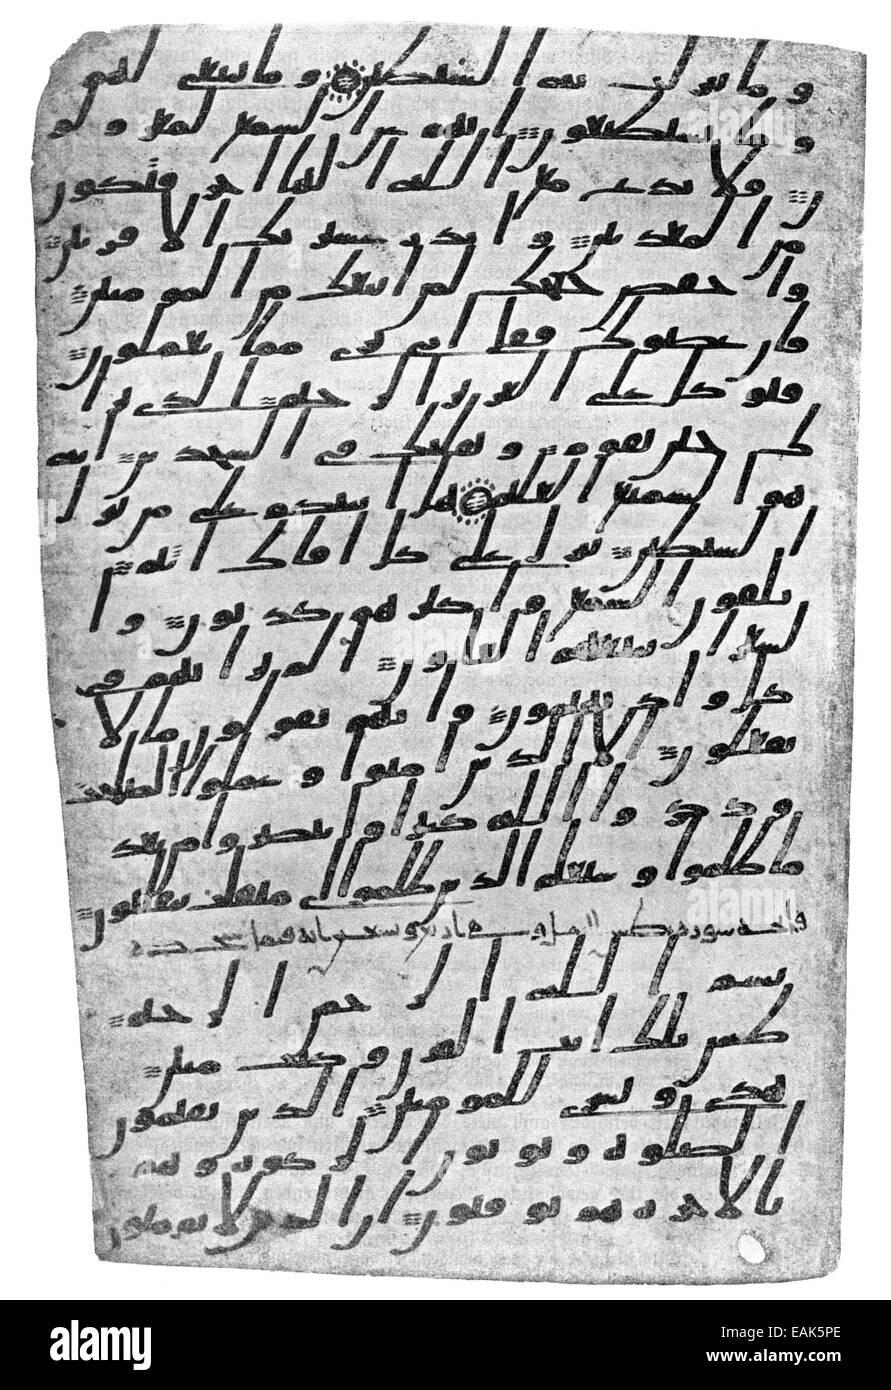 Koran manuscript from the 8th Century, Koranhandschrift aus dem 8. Jahrhundert - Stock Image